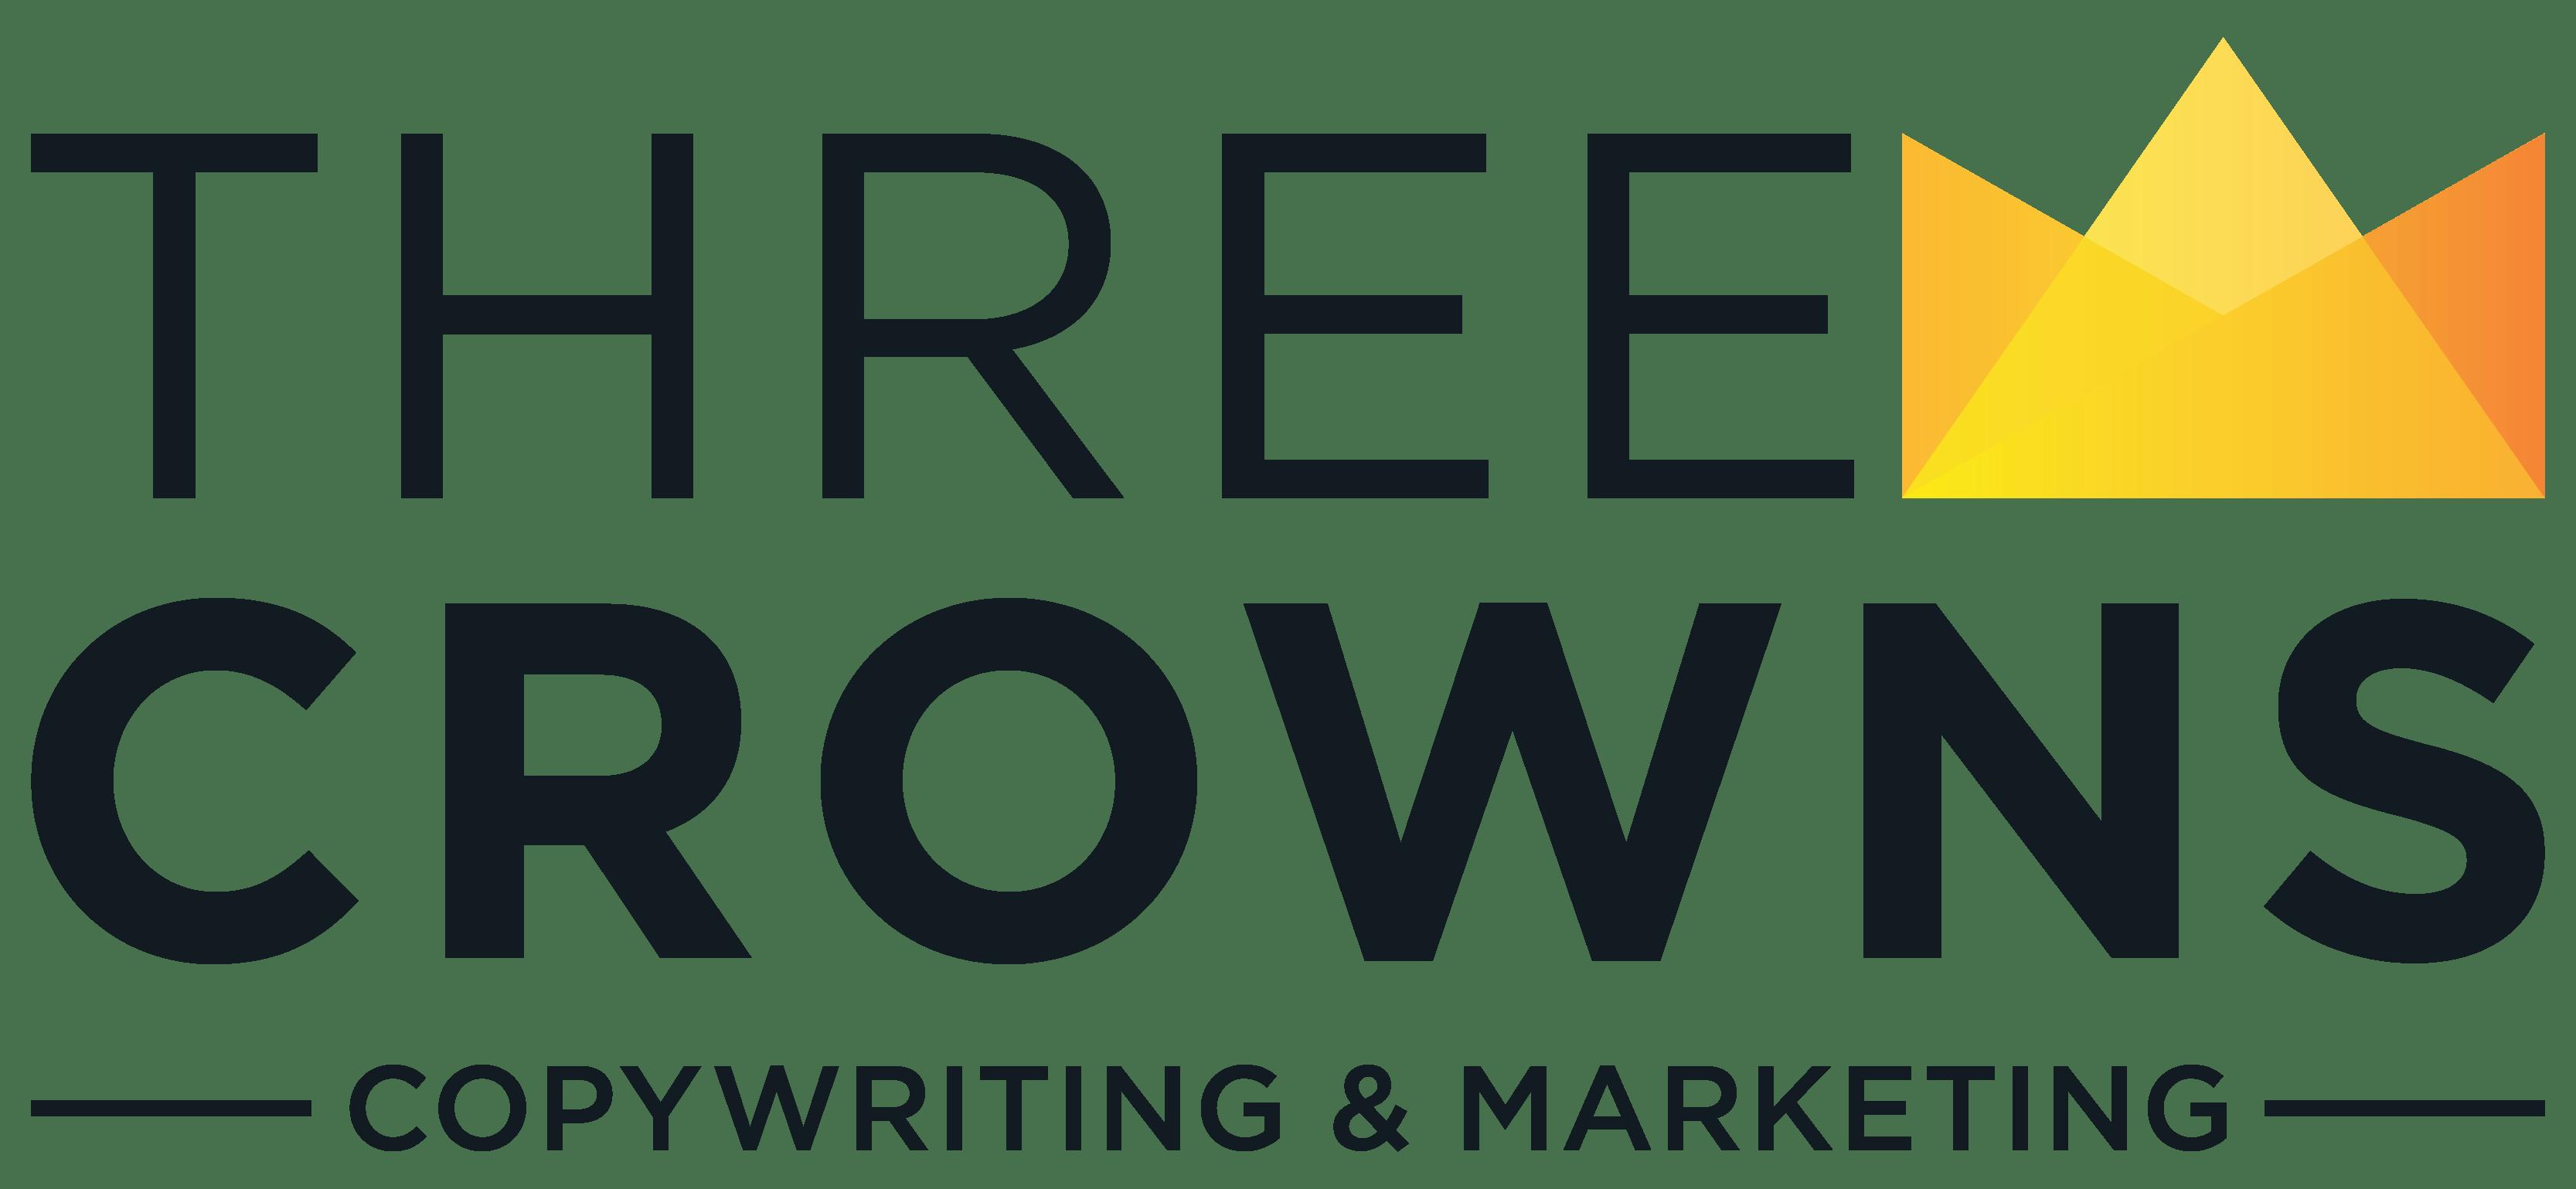 Three Crowns Copywriting & Marketing